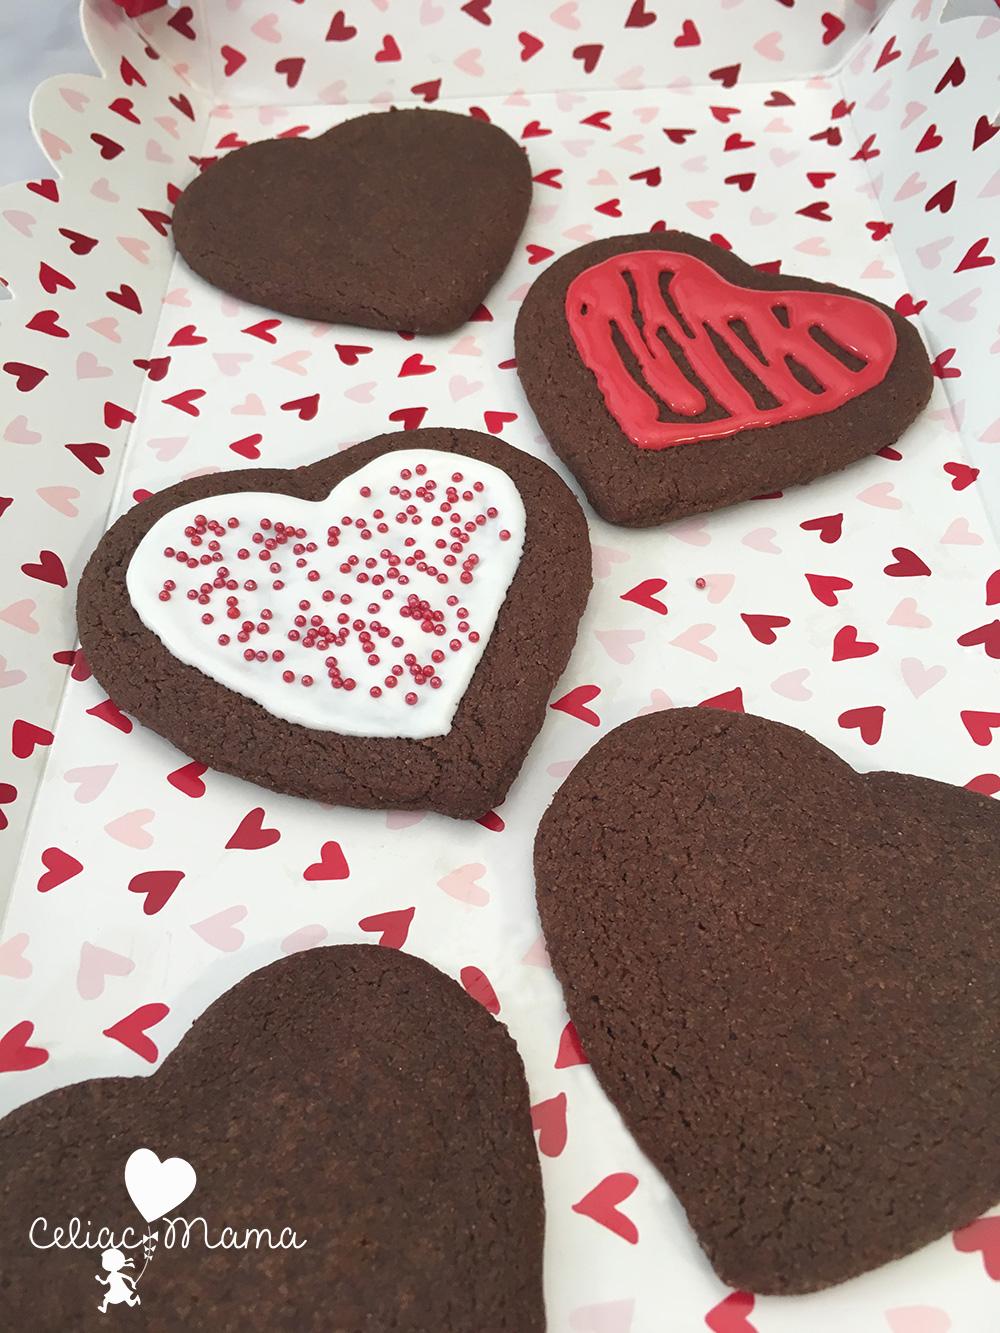 gluten-free-dairy-free-chocolate-sugar-cookies-celiacmama